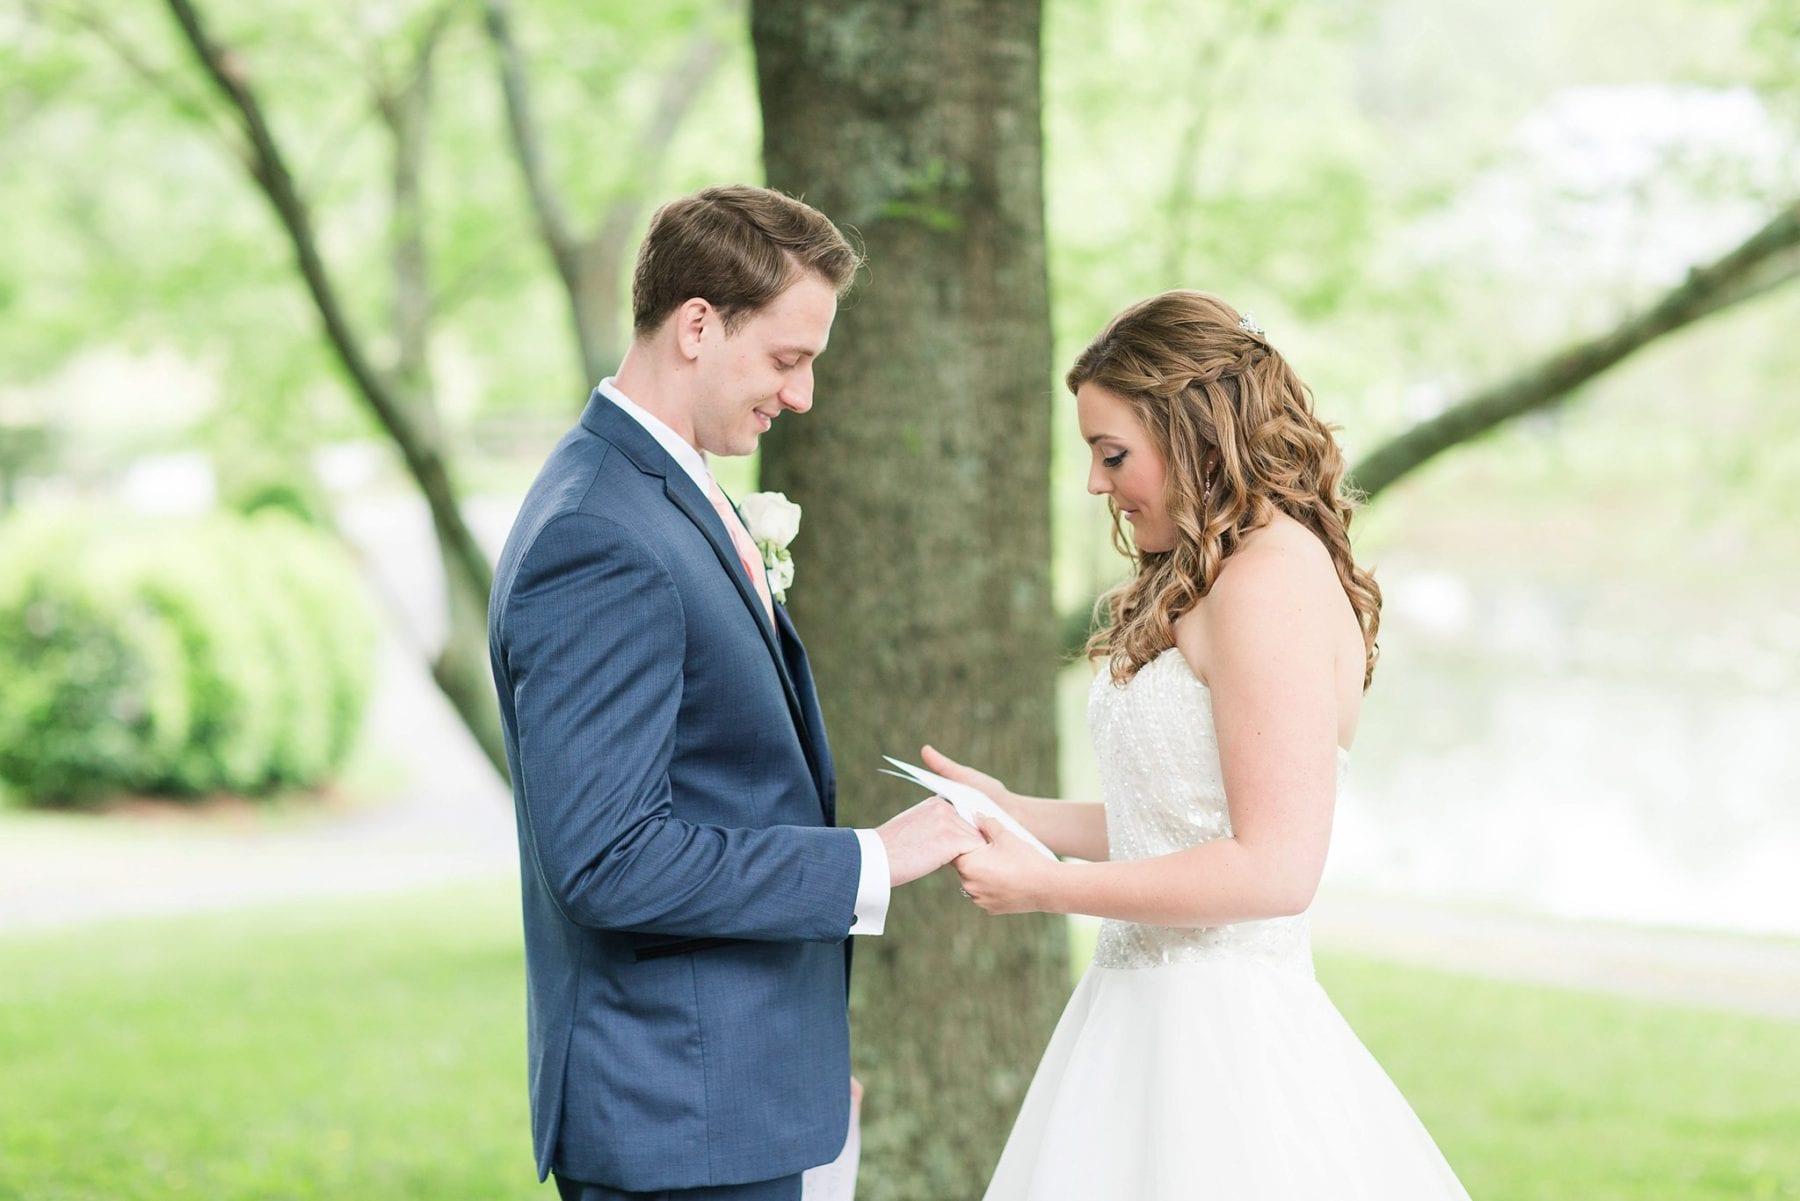 Justin & Megan Big Spring Farm Wedding Photos-92.jpg